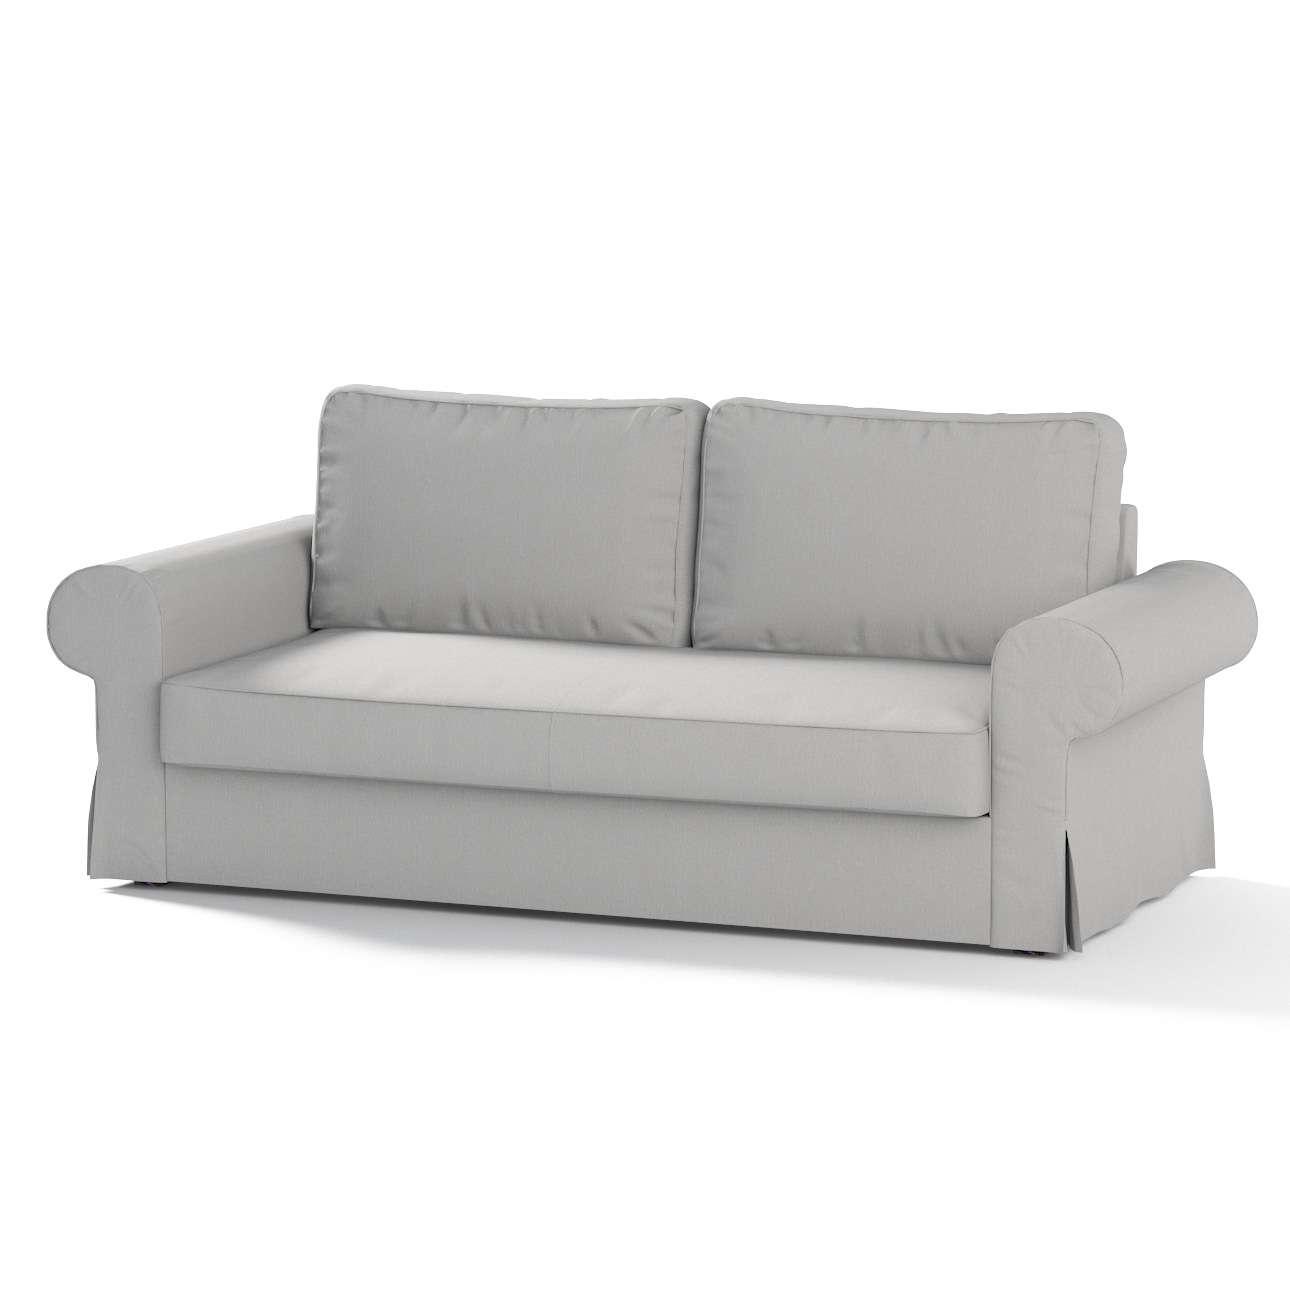 backabro 3 sitzer sofabezug ausklappbar hellgrau dekoria. Black Bedroom Furniture Sets. Home Design Ideas